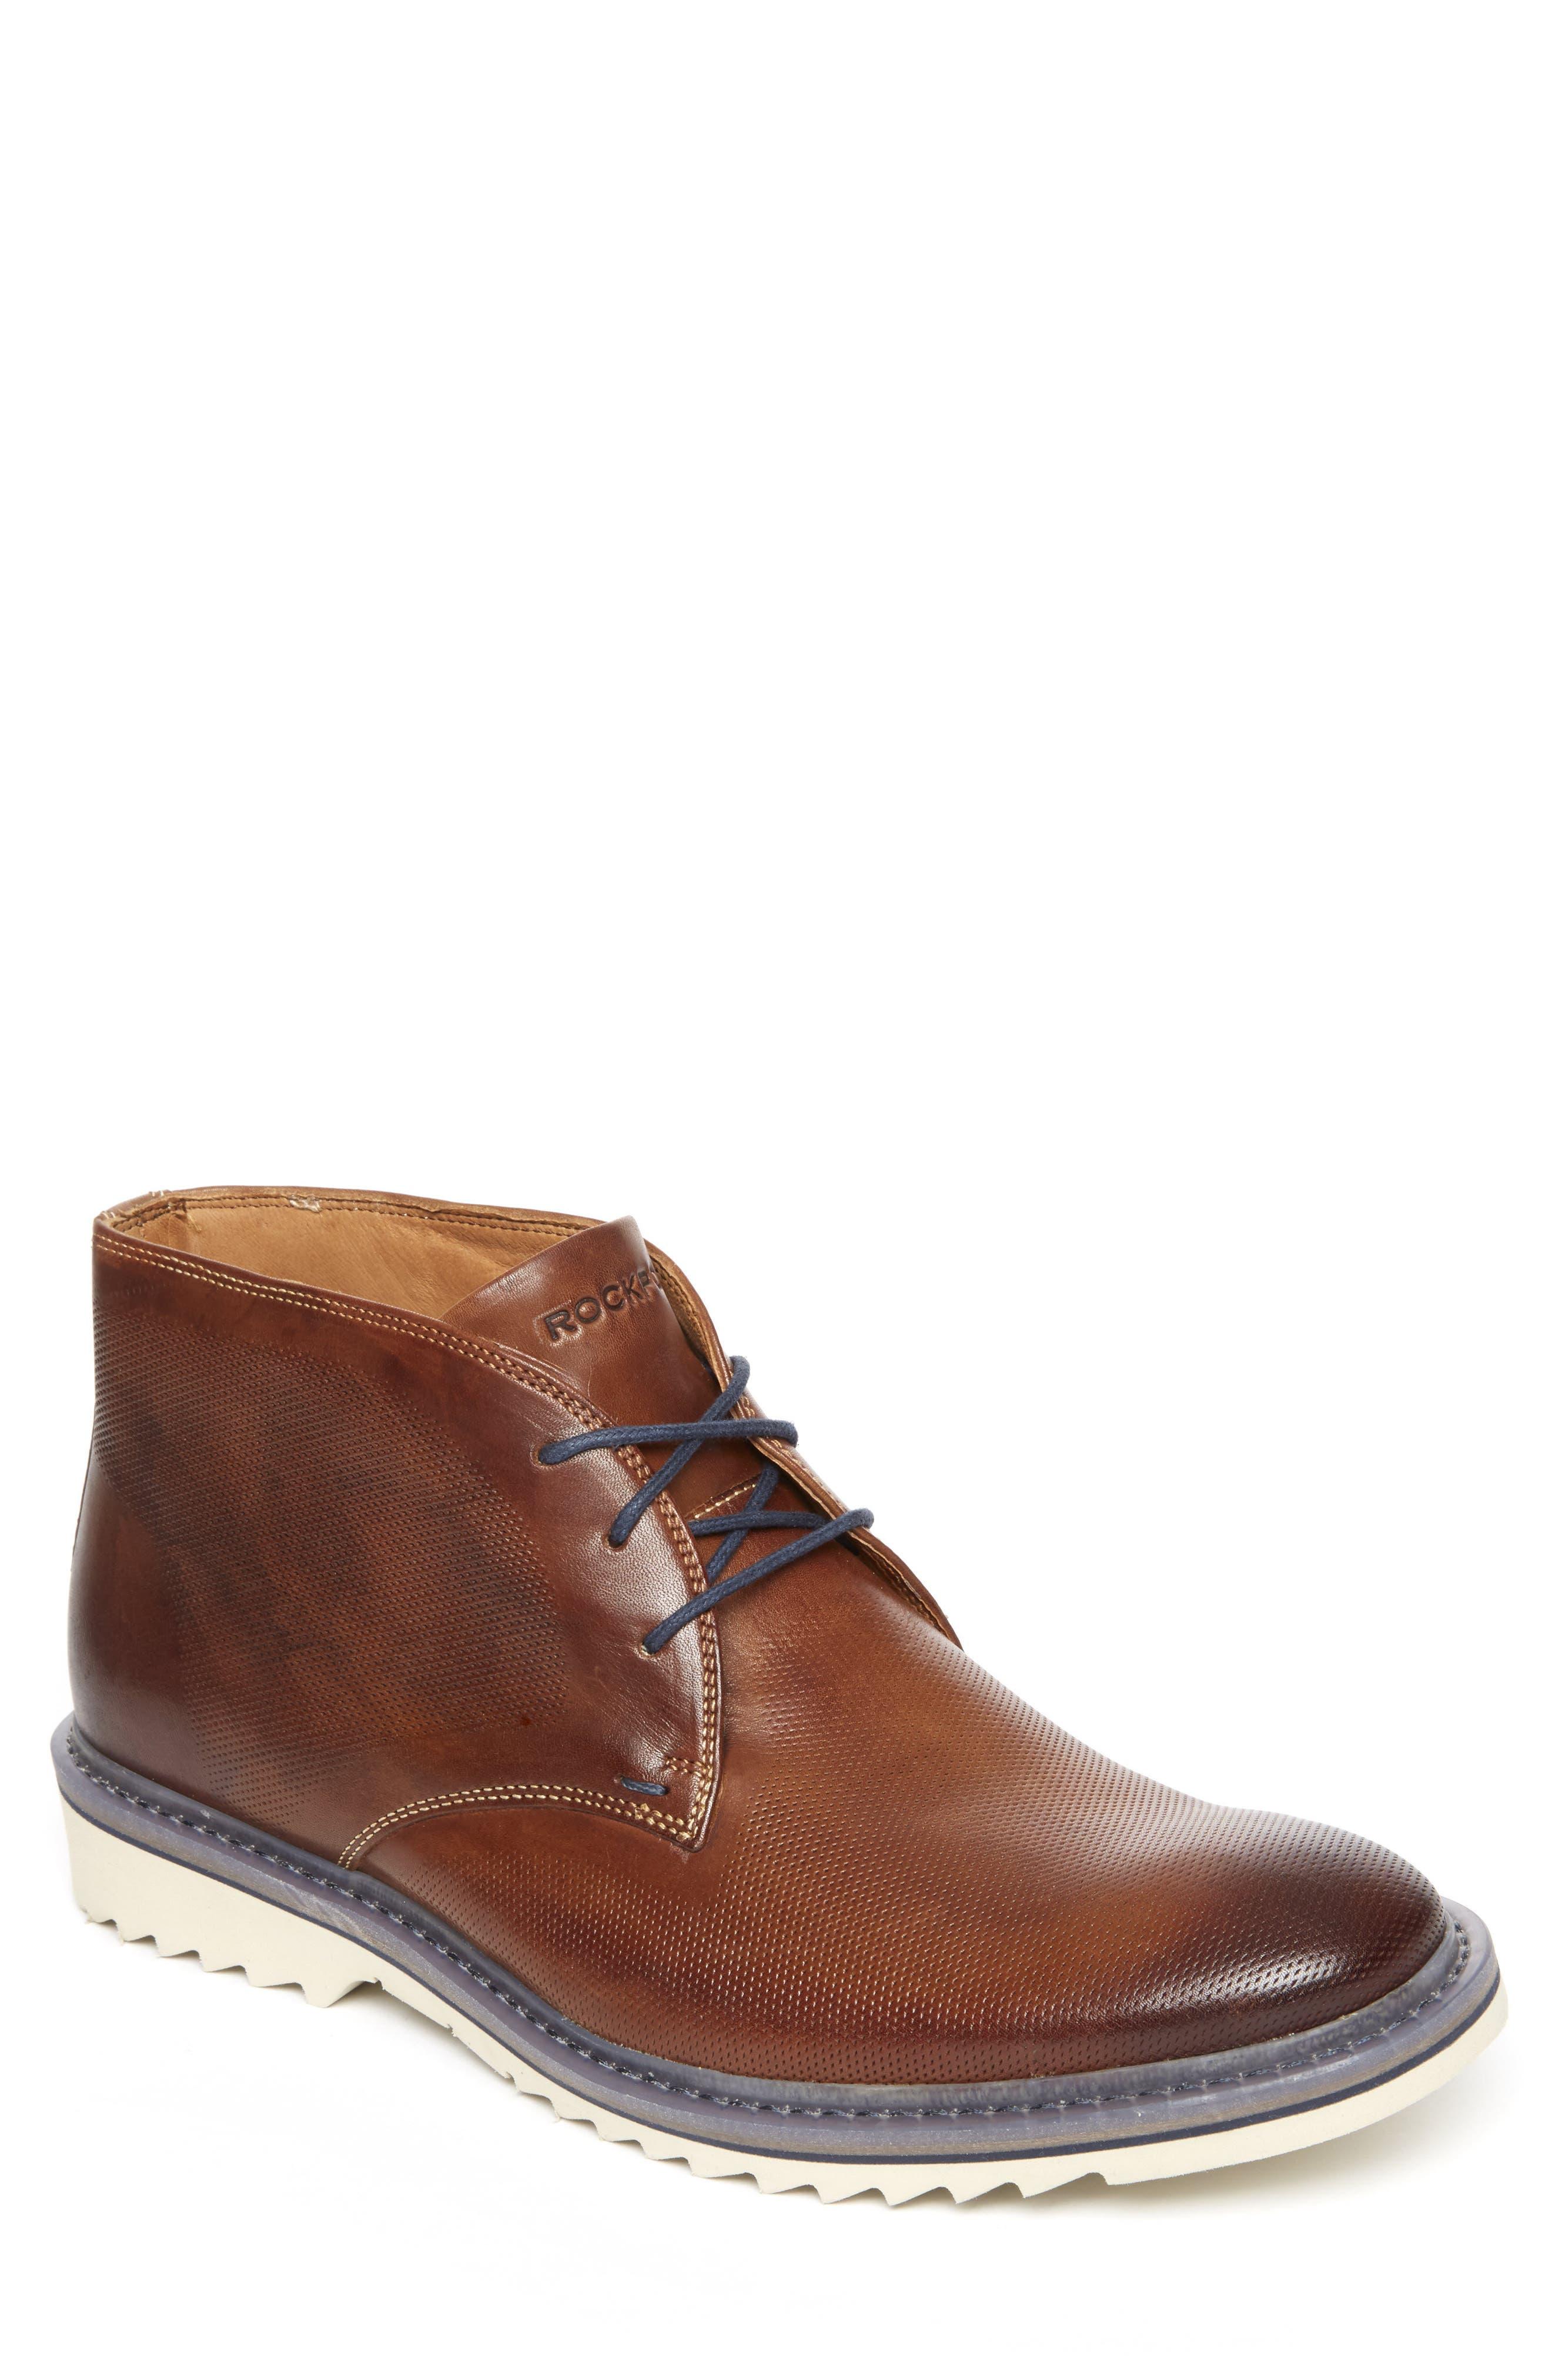 ROCKPORT Jaxson Chukka Boot, Main, color, 200